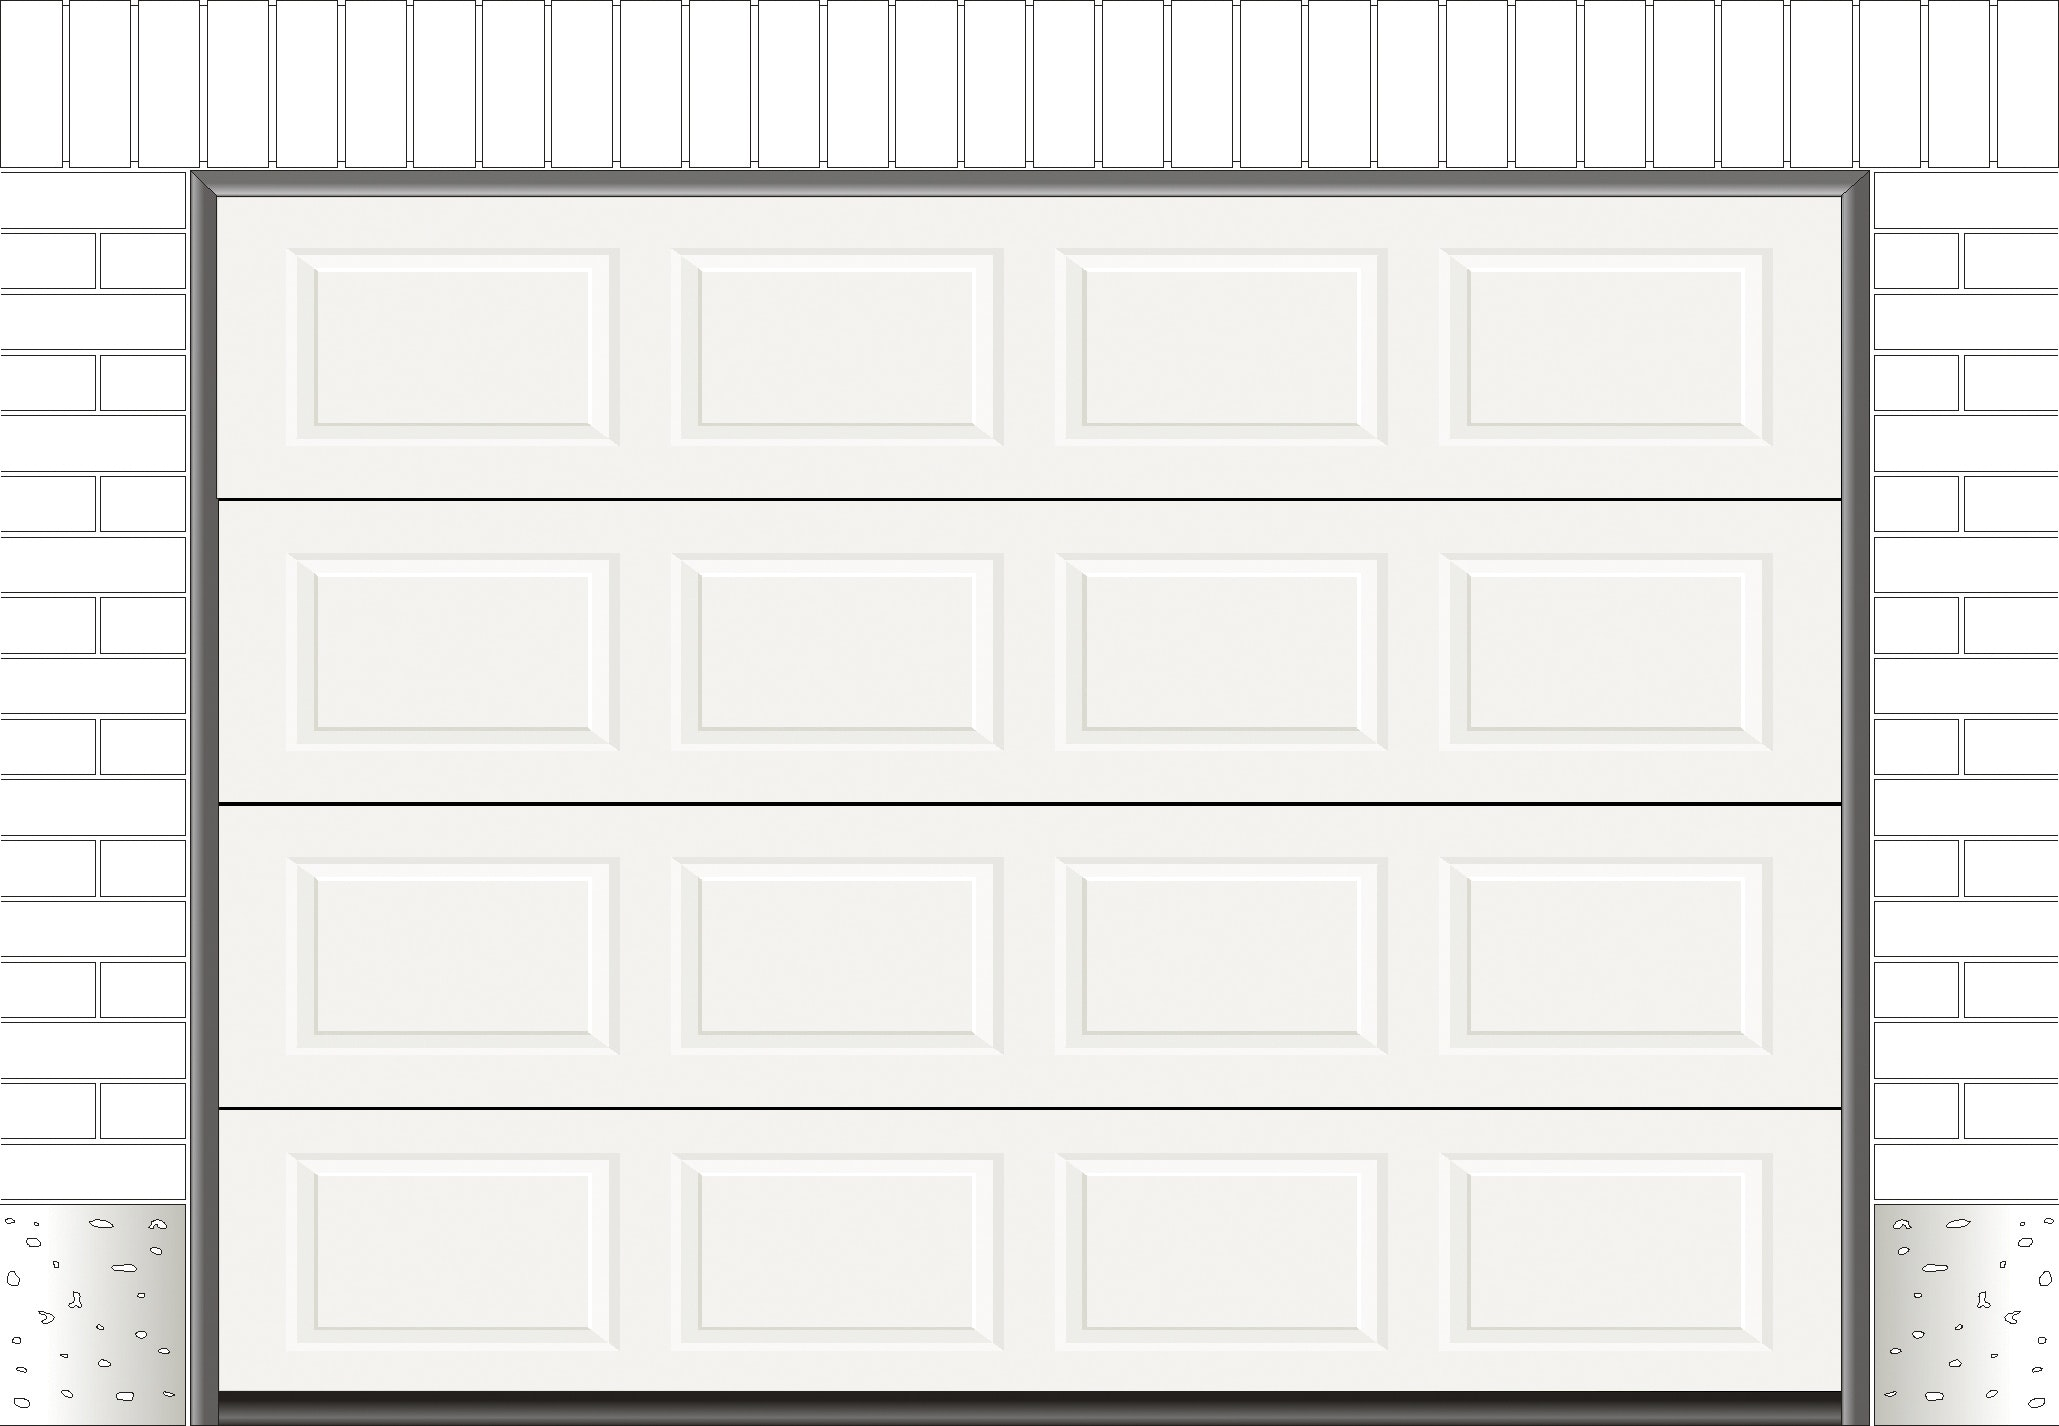 Garageport Garageportexperten R30 Kassett Vit 2500x2125 mm Ink. Skenor